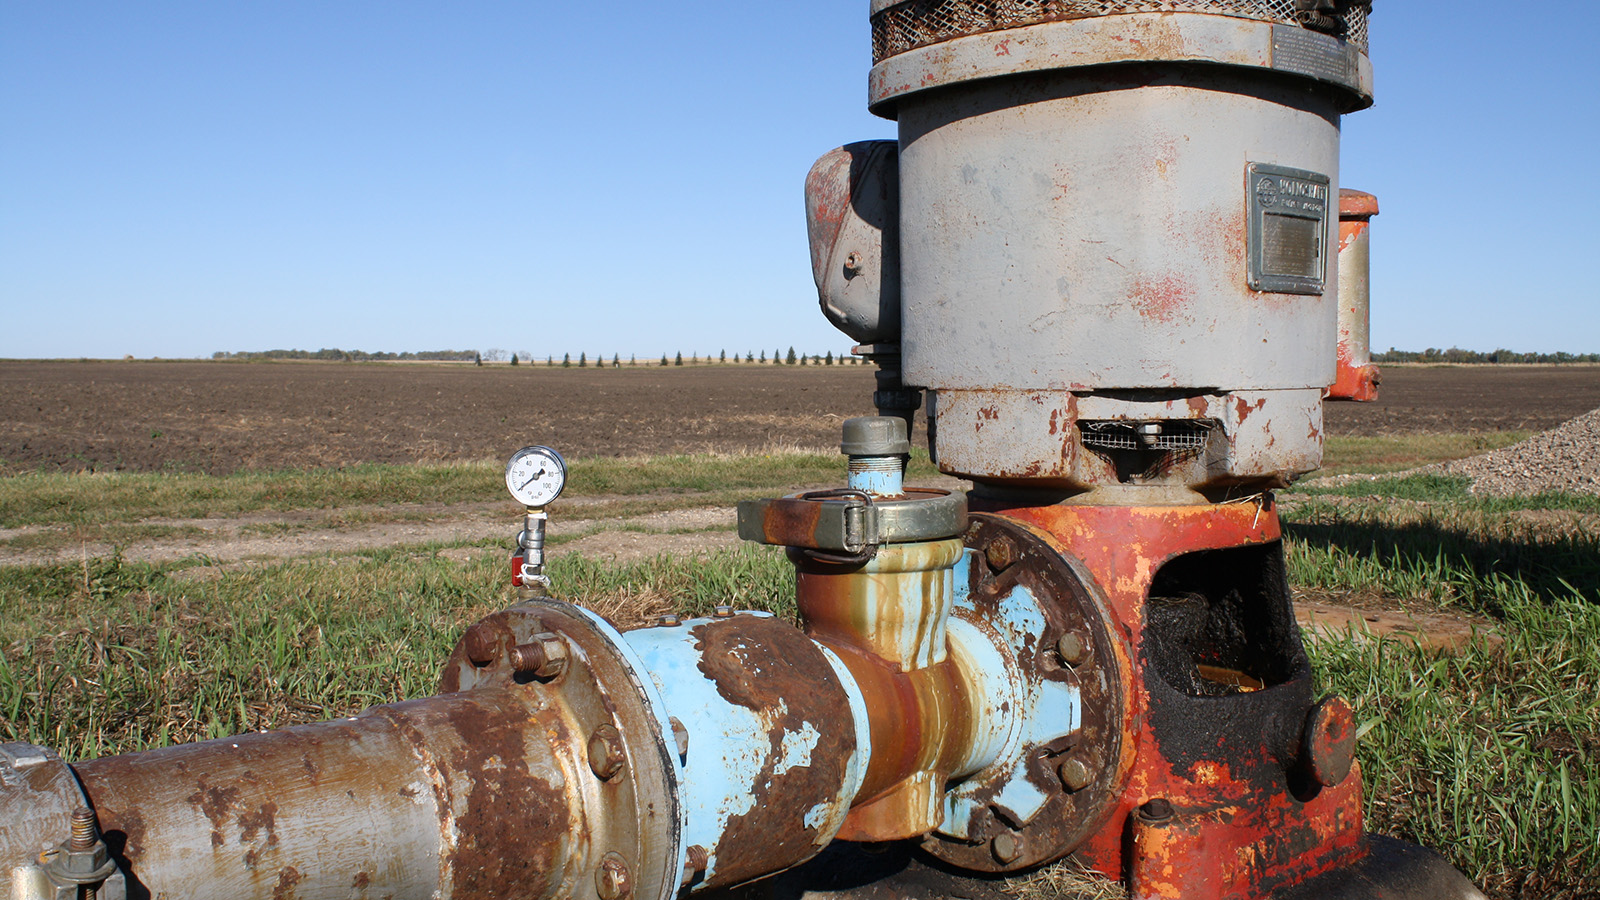 Irrigation Pump, carlpenergy ( Flickr )